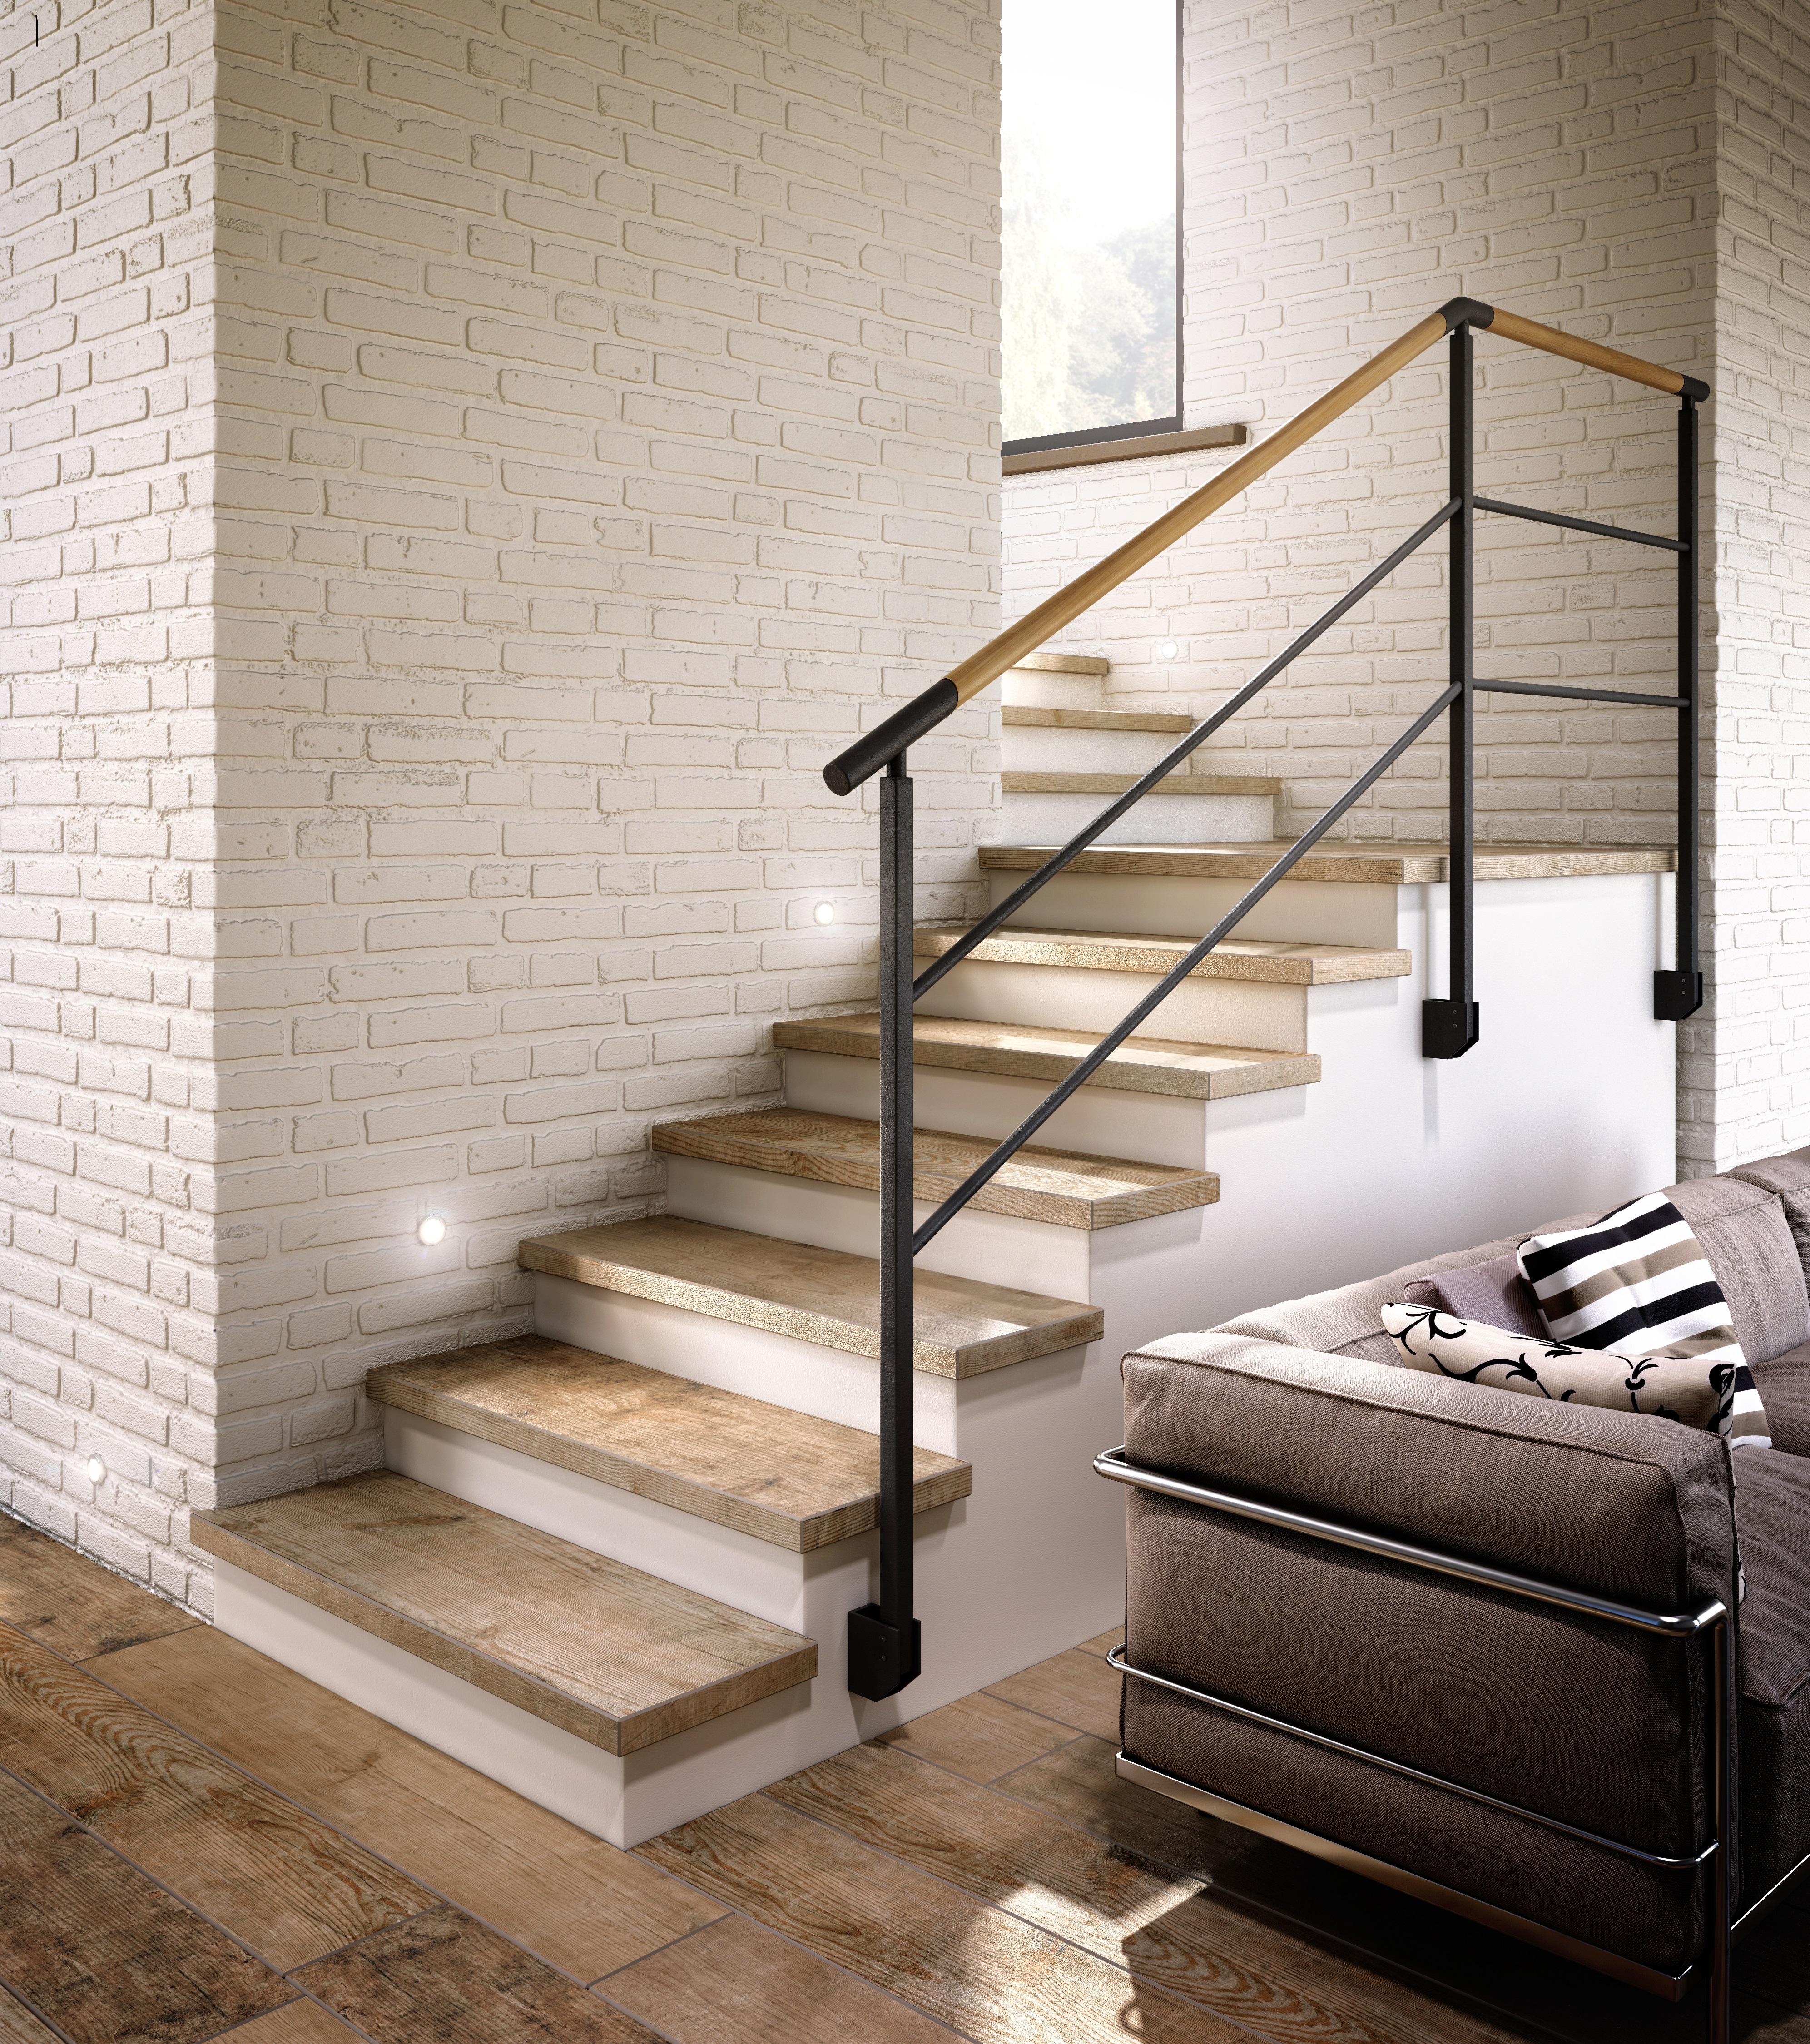 holzoptikfliesen fliesen kaufen keramik loft gmbh. Black Bedroom Furniture Sets. Home Design Ideas